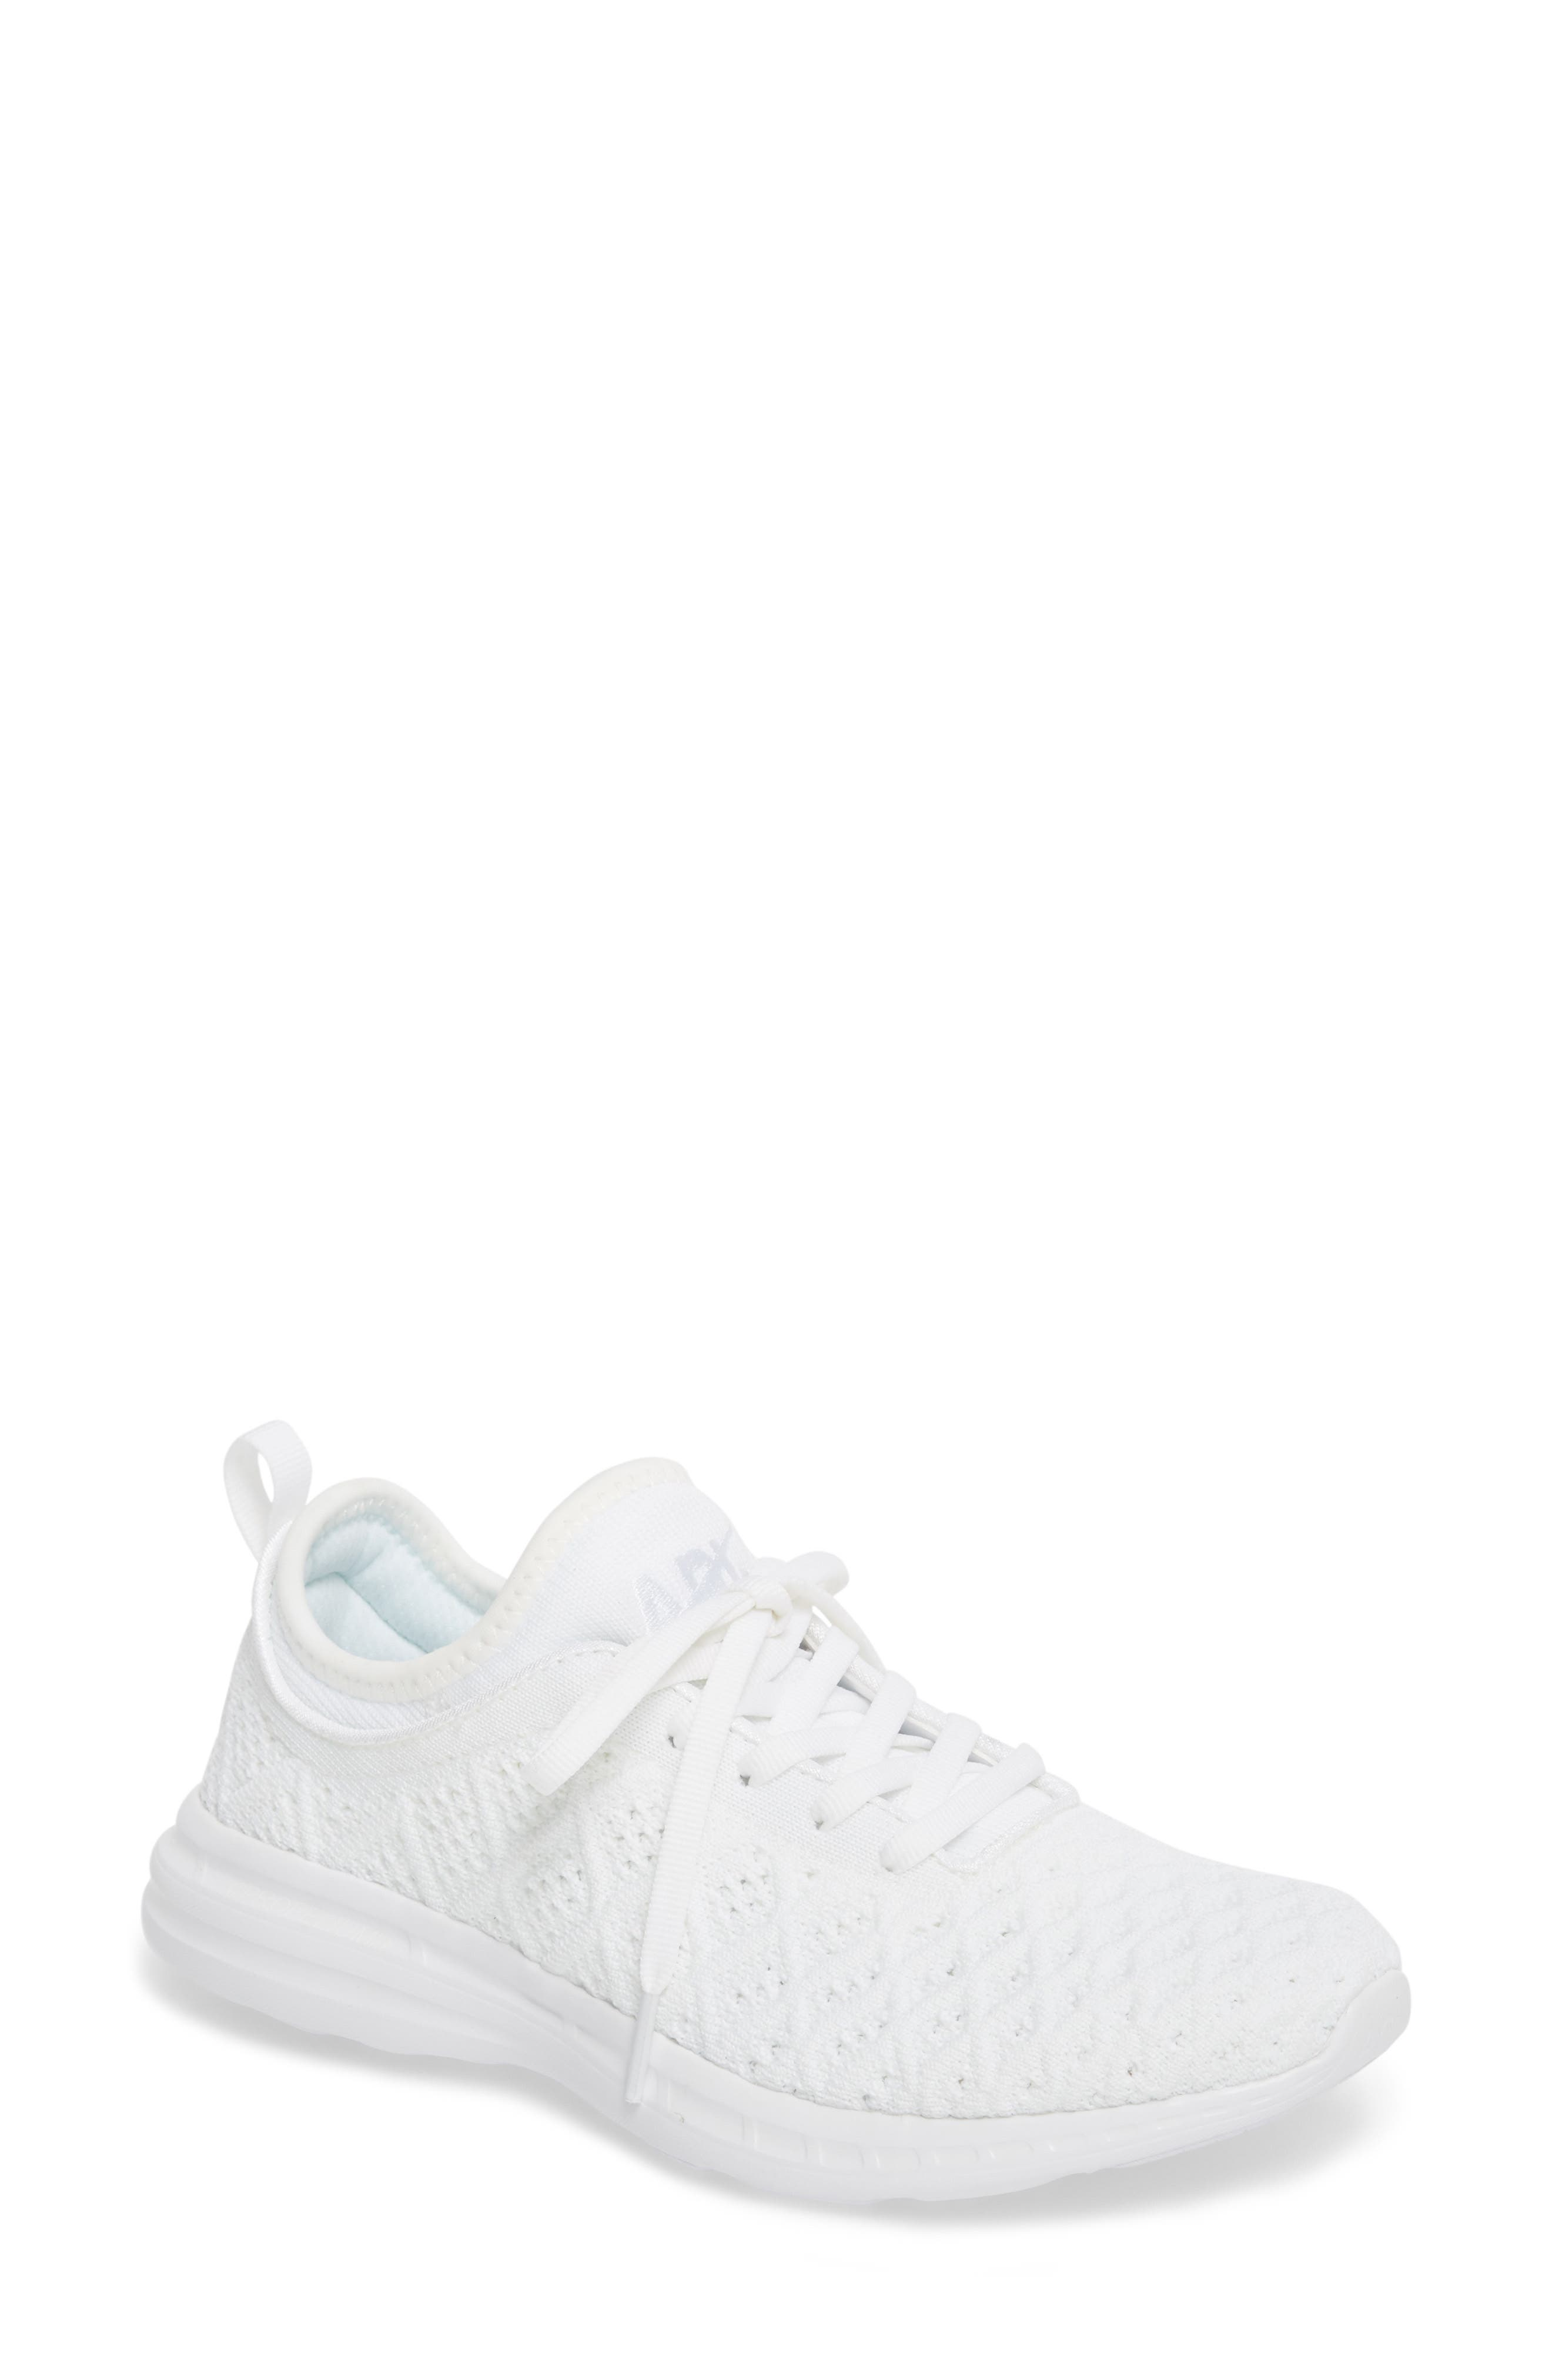 APL ATHLETIC PROPULSION LABS 'Techloom Phantom' Running Shoe in White